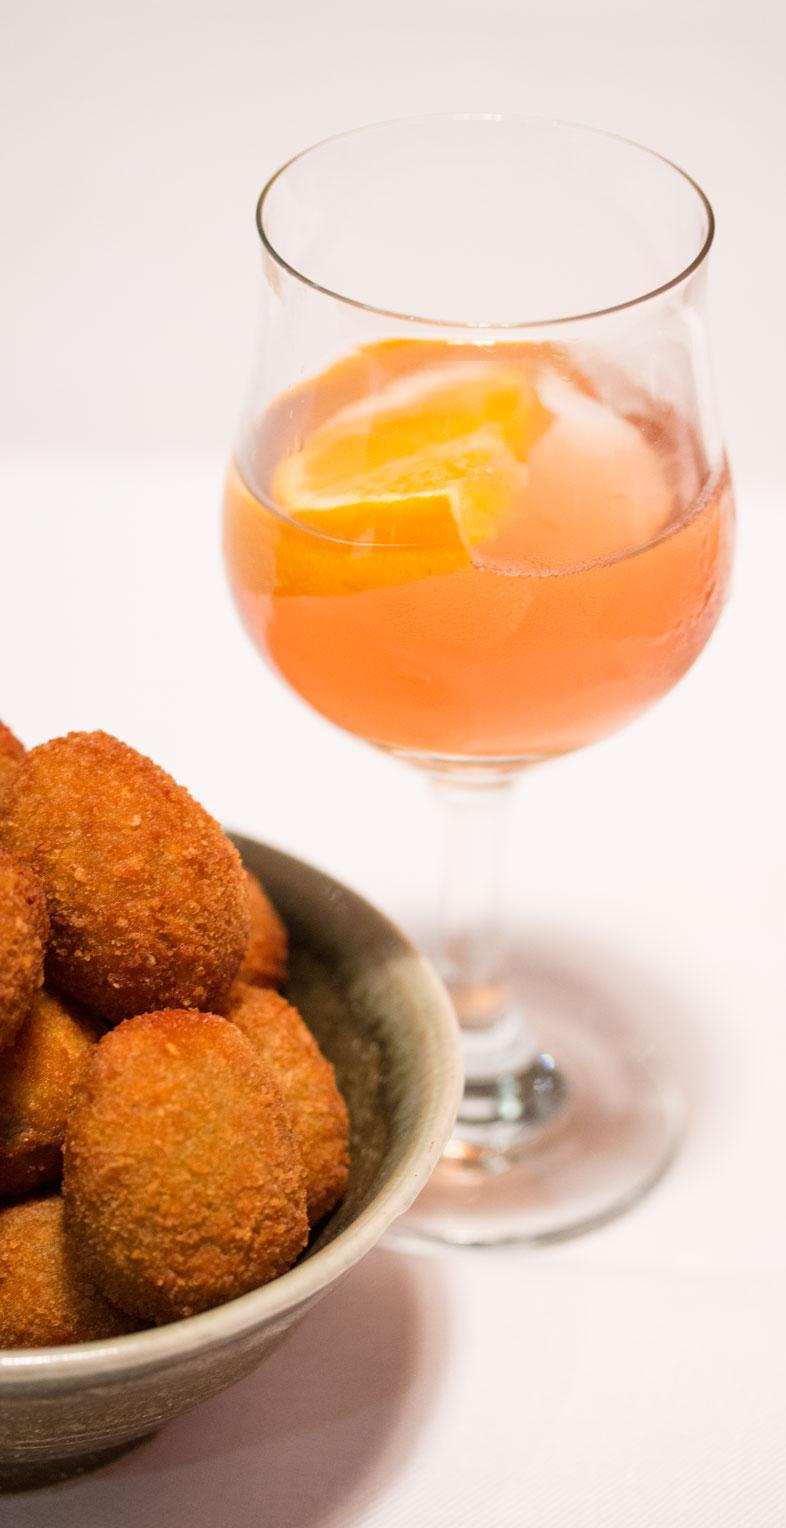 Mele e Pere vermouth